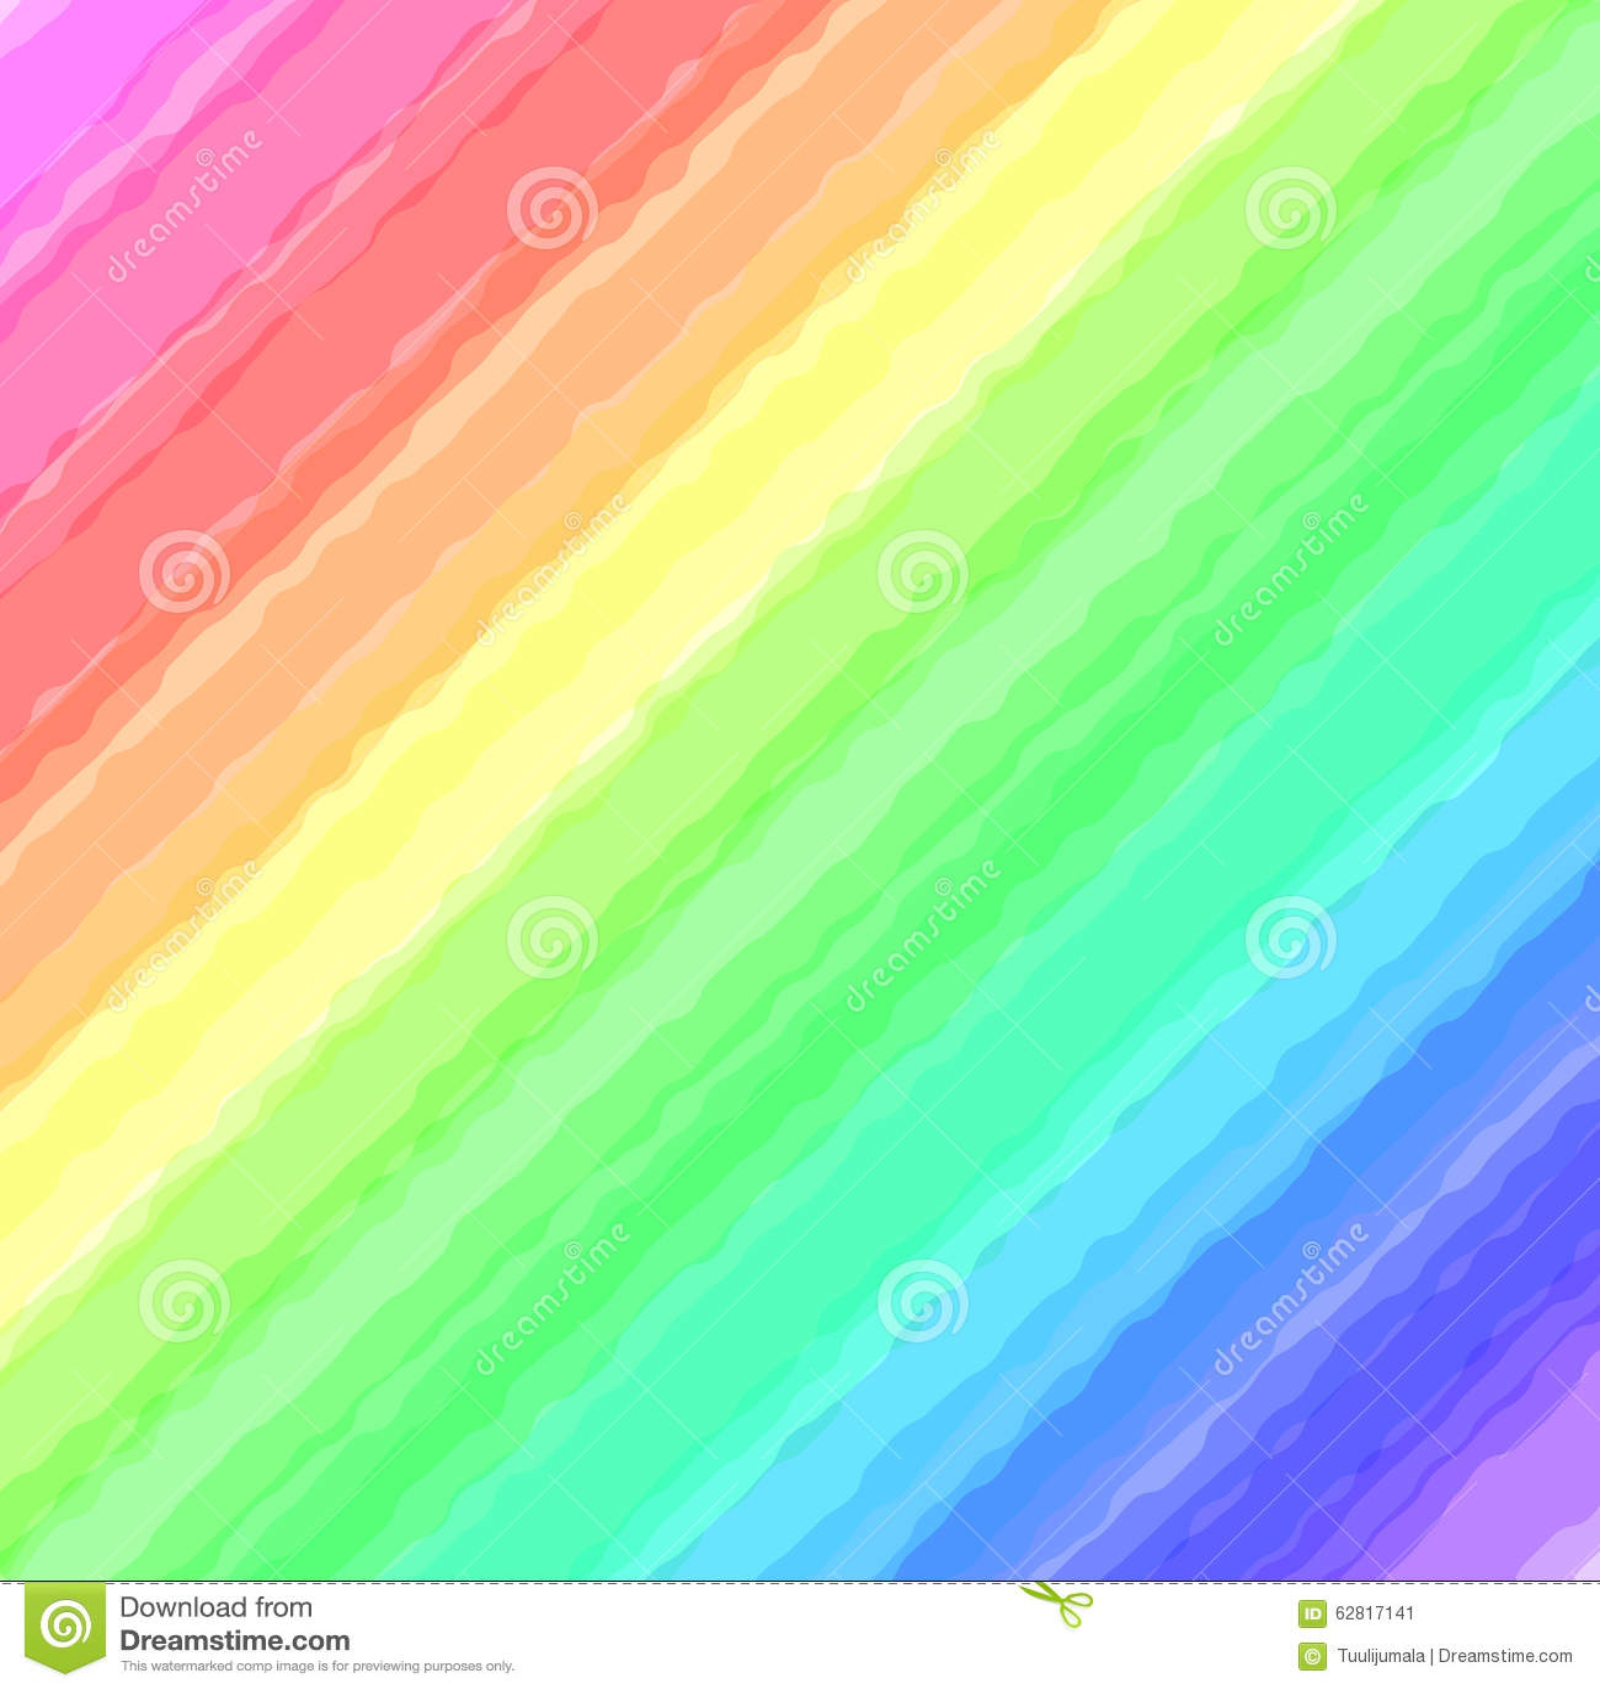 Colorful pastel color spectrum background stock vector for Paint color spectrum